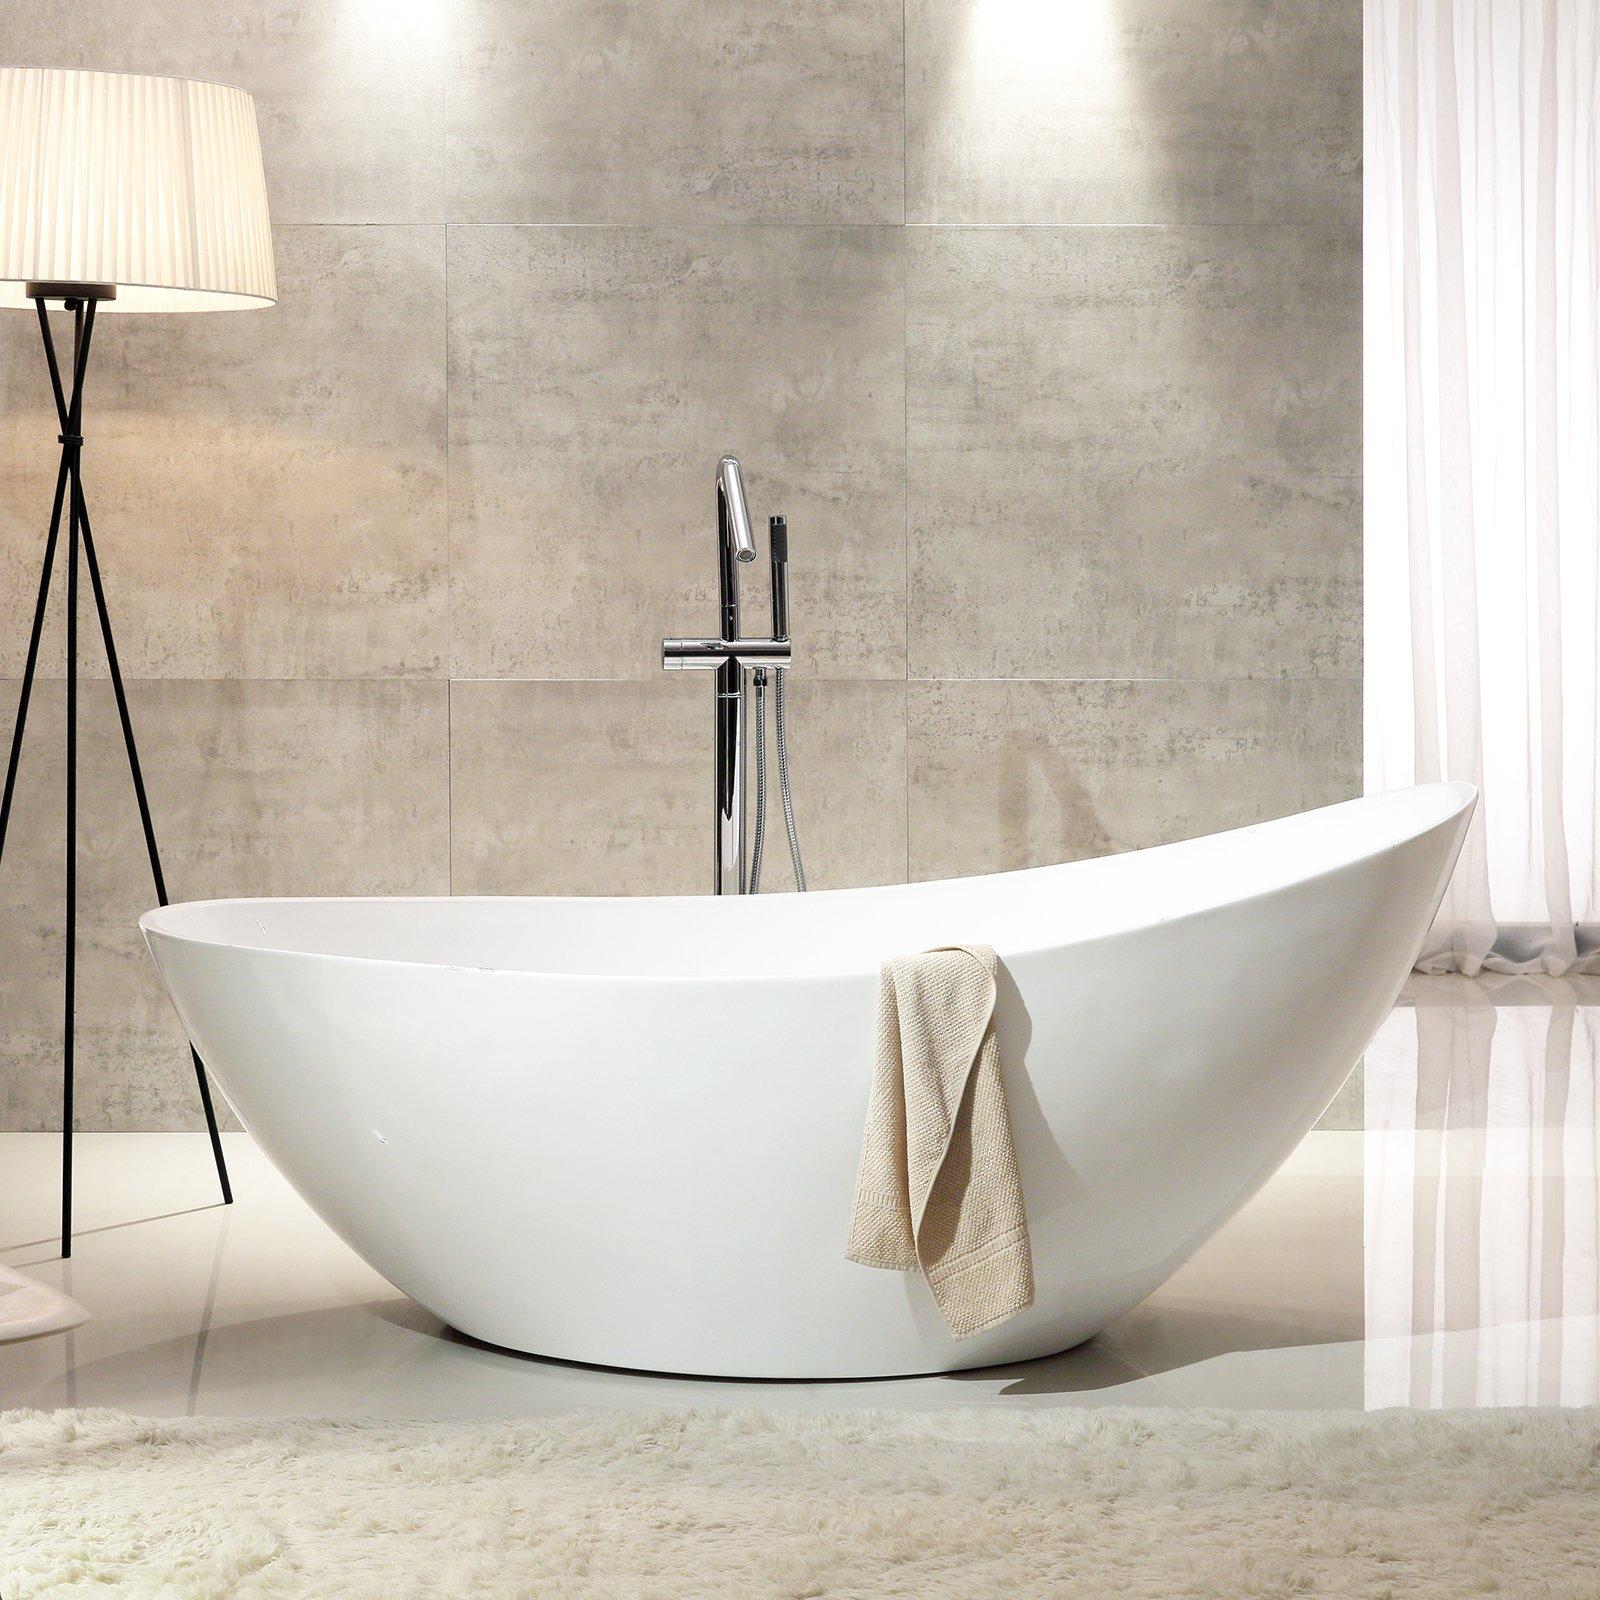 Freistehende Badewanne VICE aus Acryl - 183,5 x 78,5 x 77 cm - Farbe & Standarmatur wählbar zoom thumbnail 4